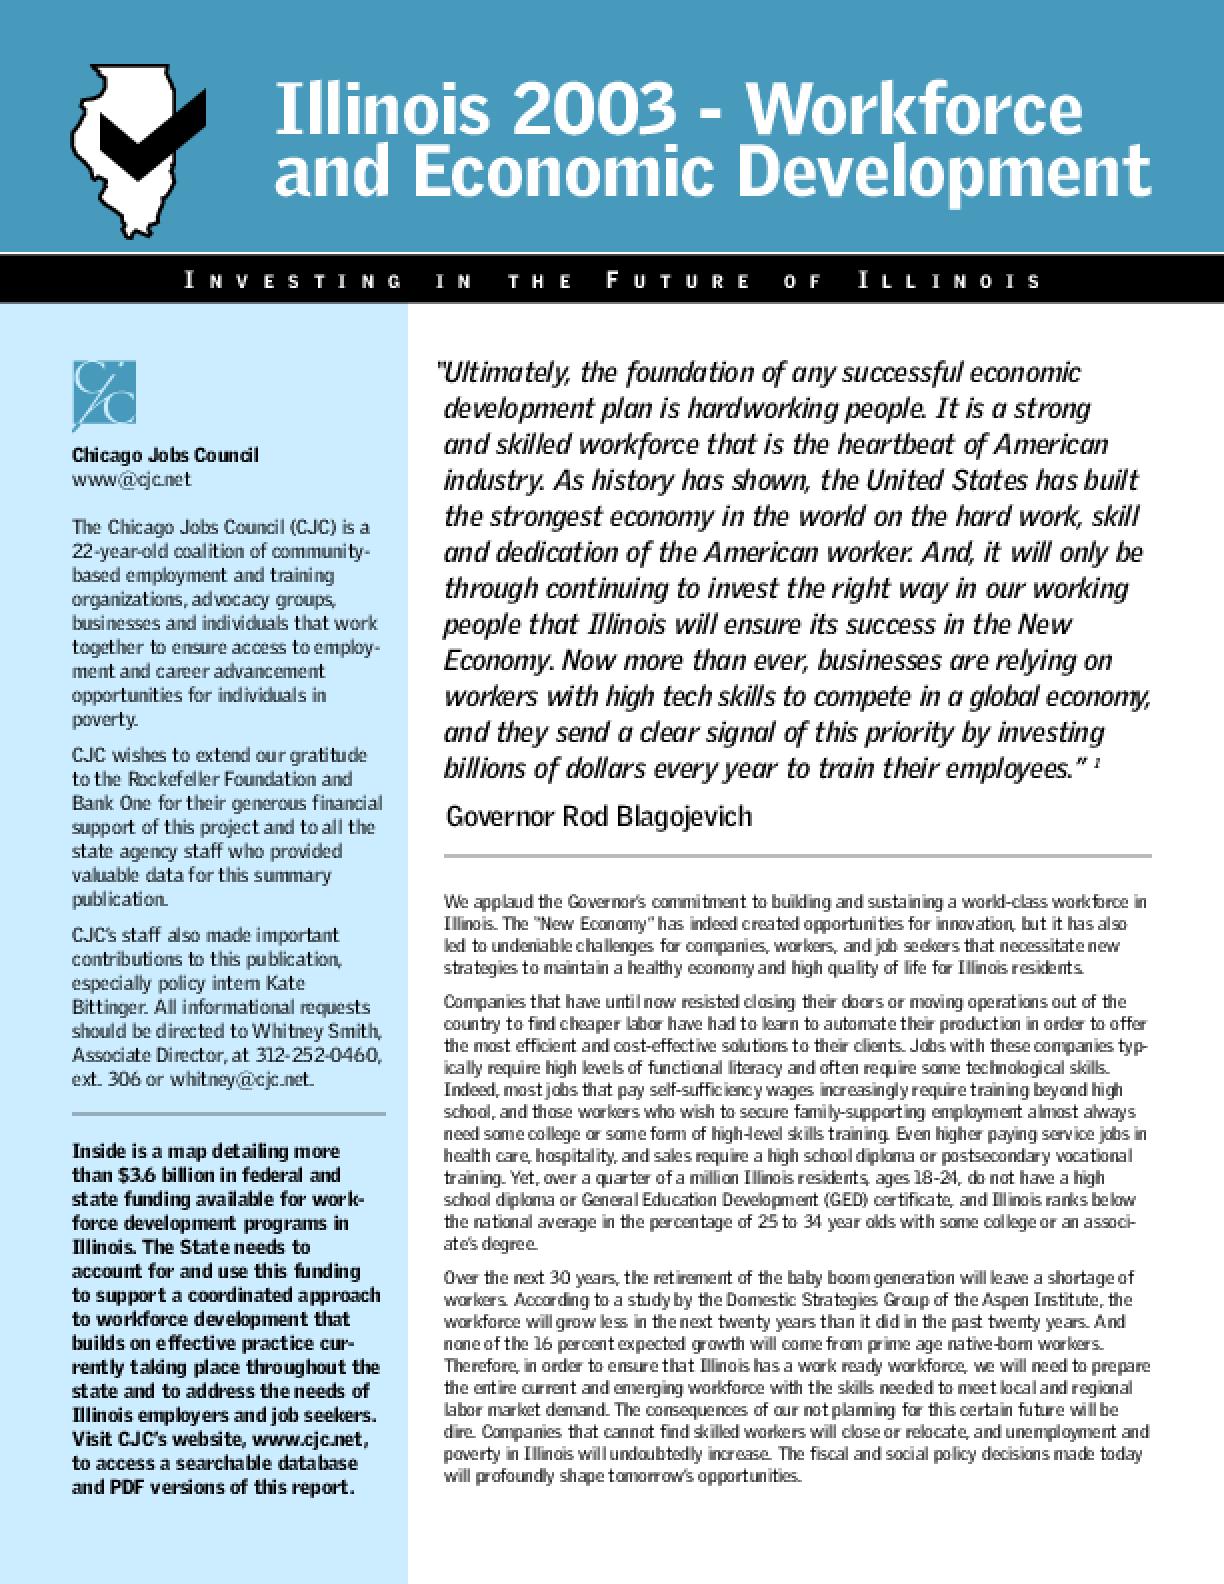 Illinois 2003 - Workforce and Economic Development: Investing in the Future of Illinois